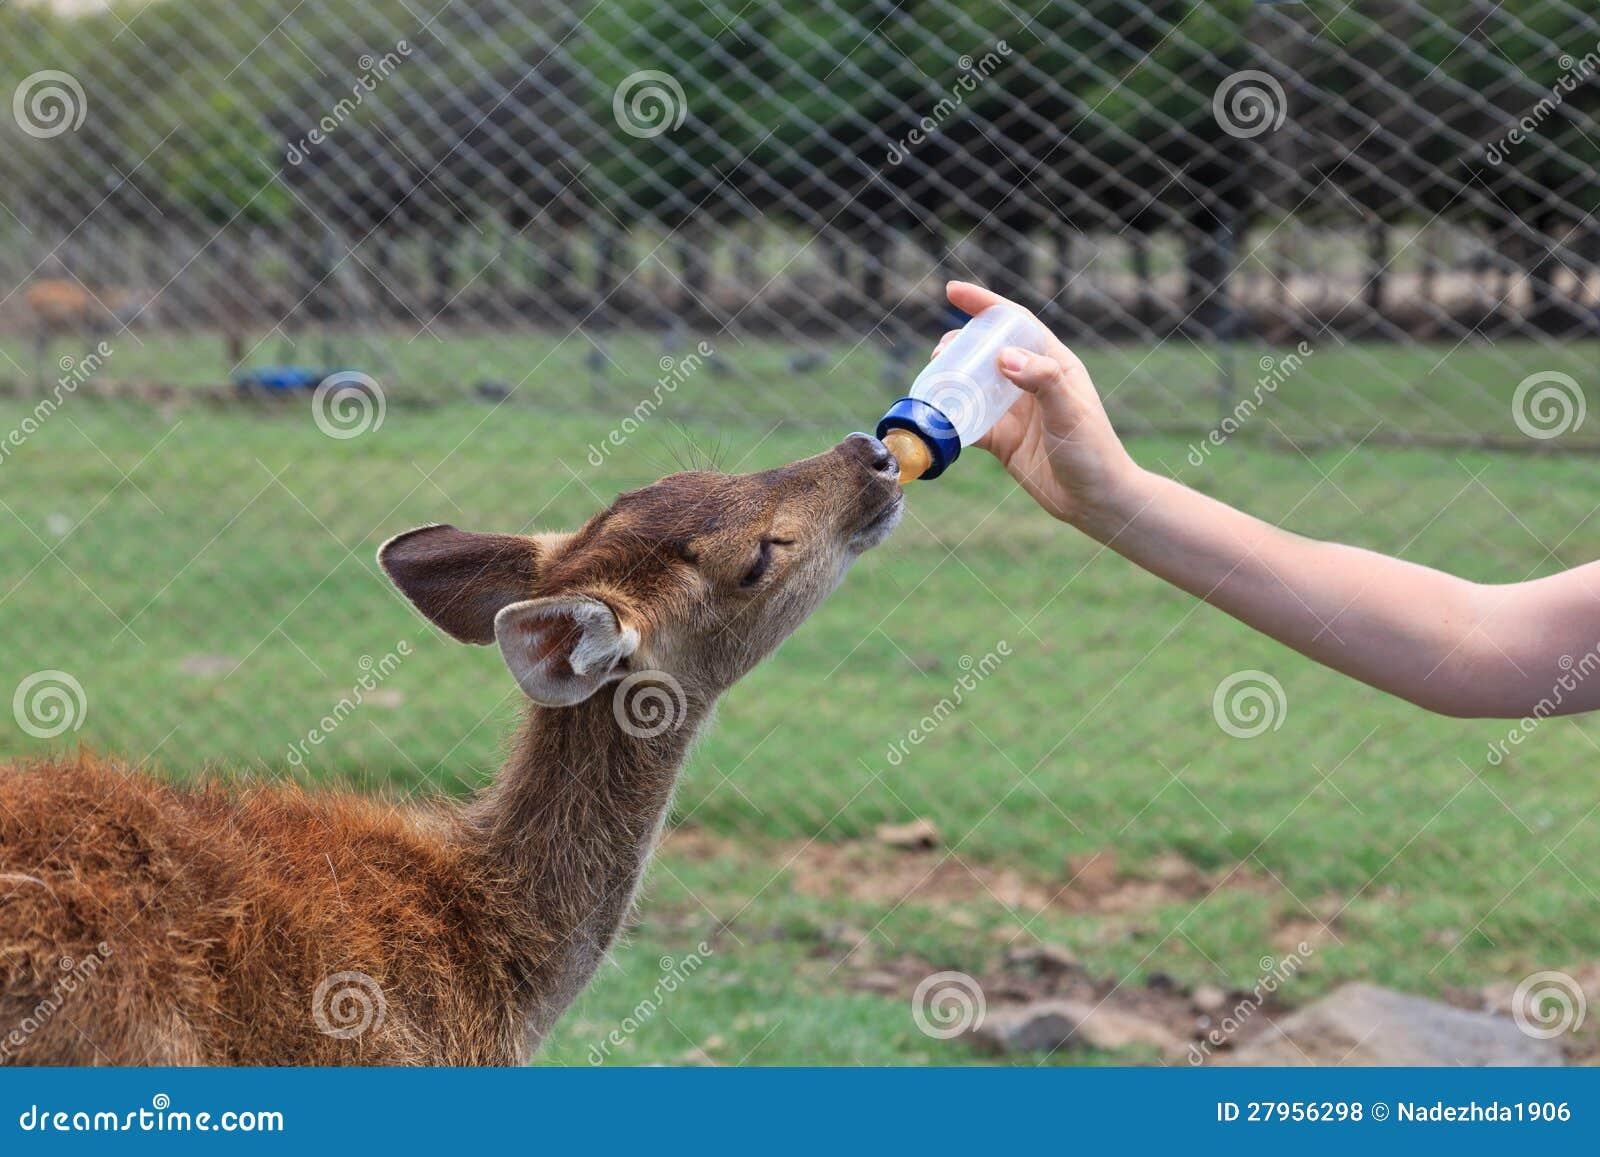 Feeding Baby Goat Royalty Free Stock Photos Image 27956298